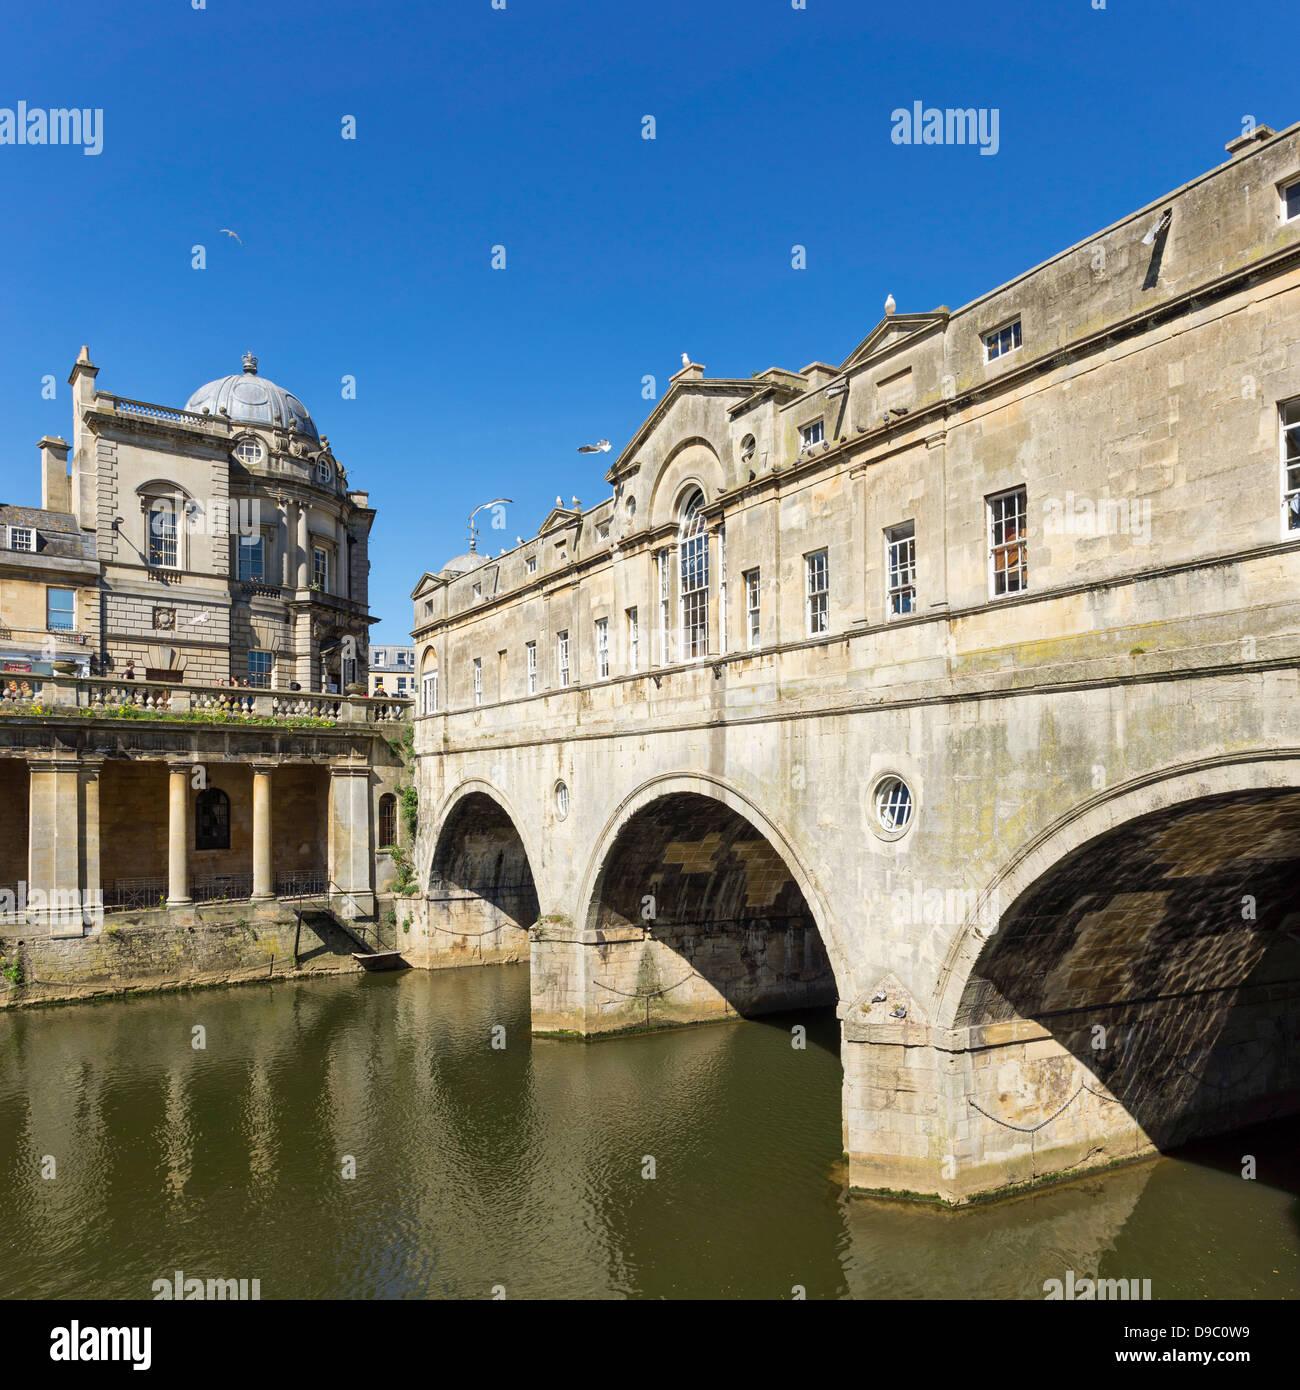 Pulteney Bridge, Bath, England - Stock Image